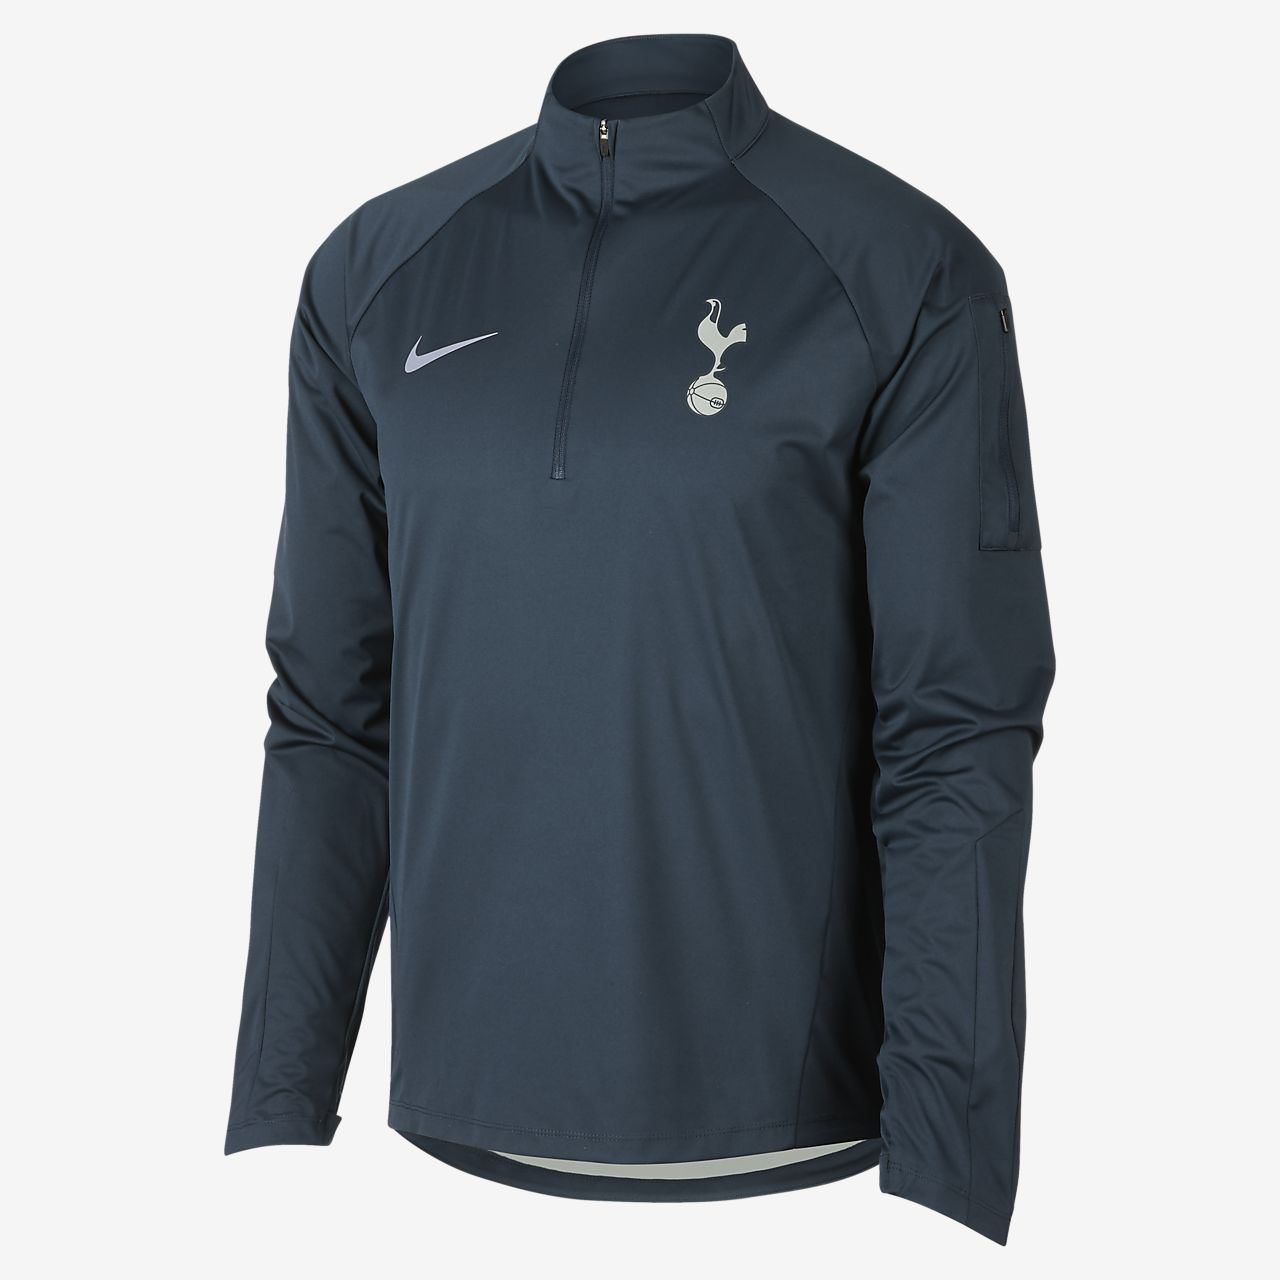 camisetas de futbol Tottenham Hotspur precio